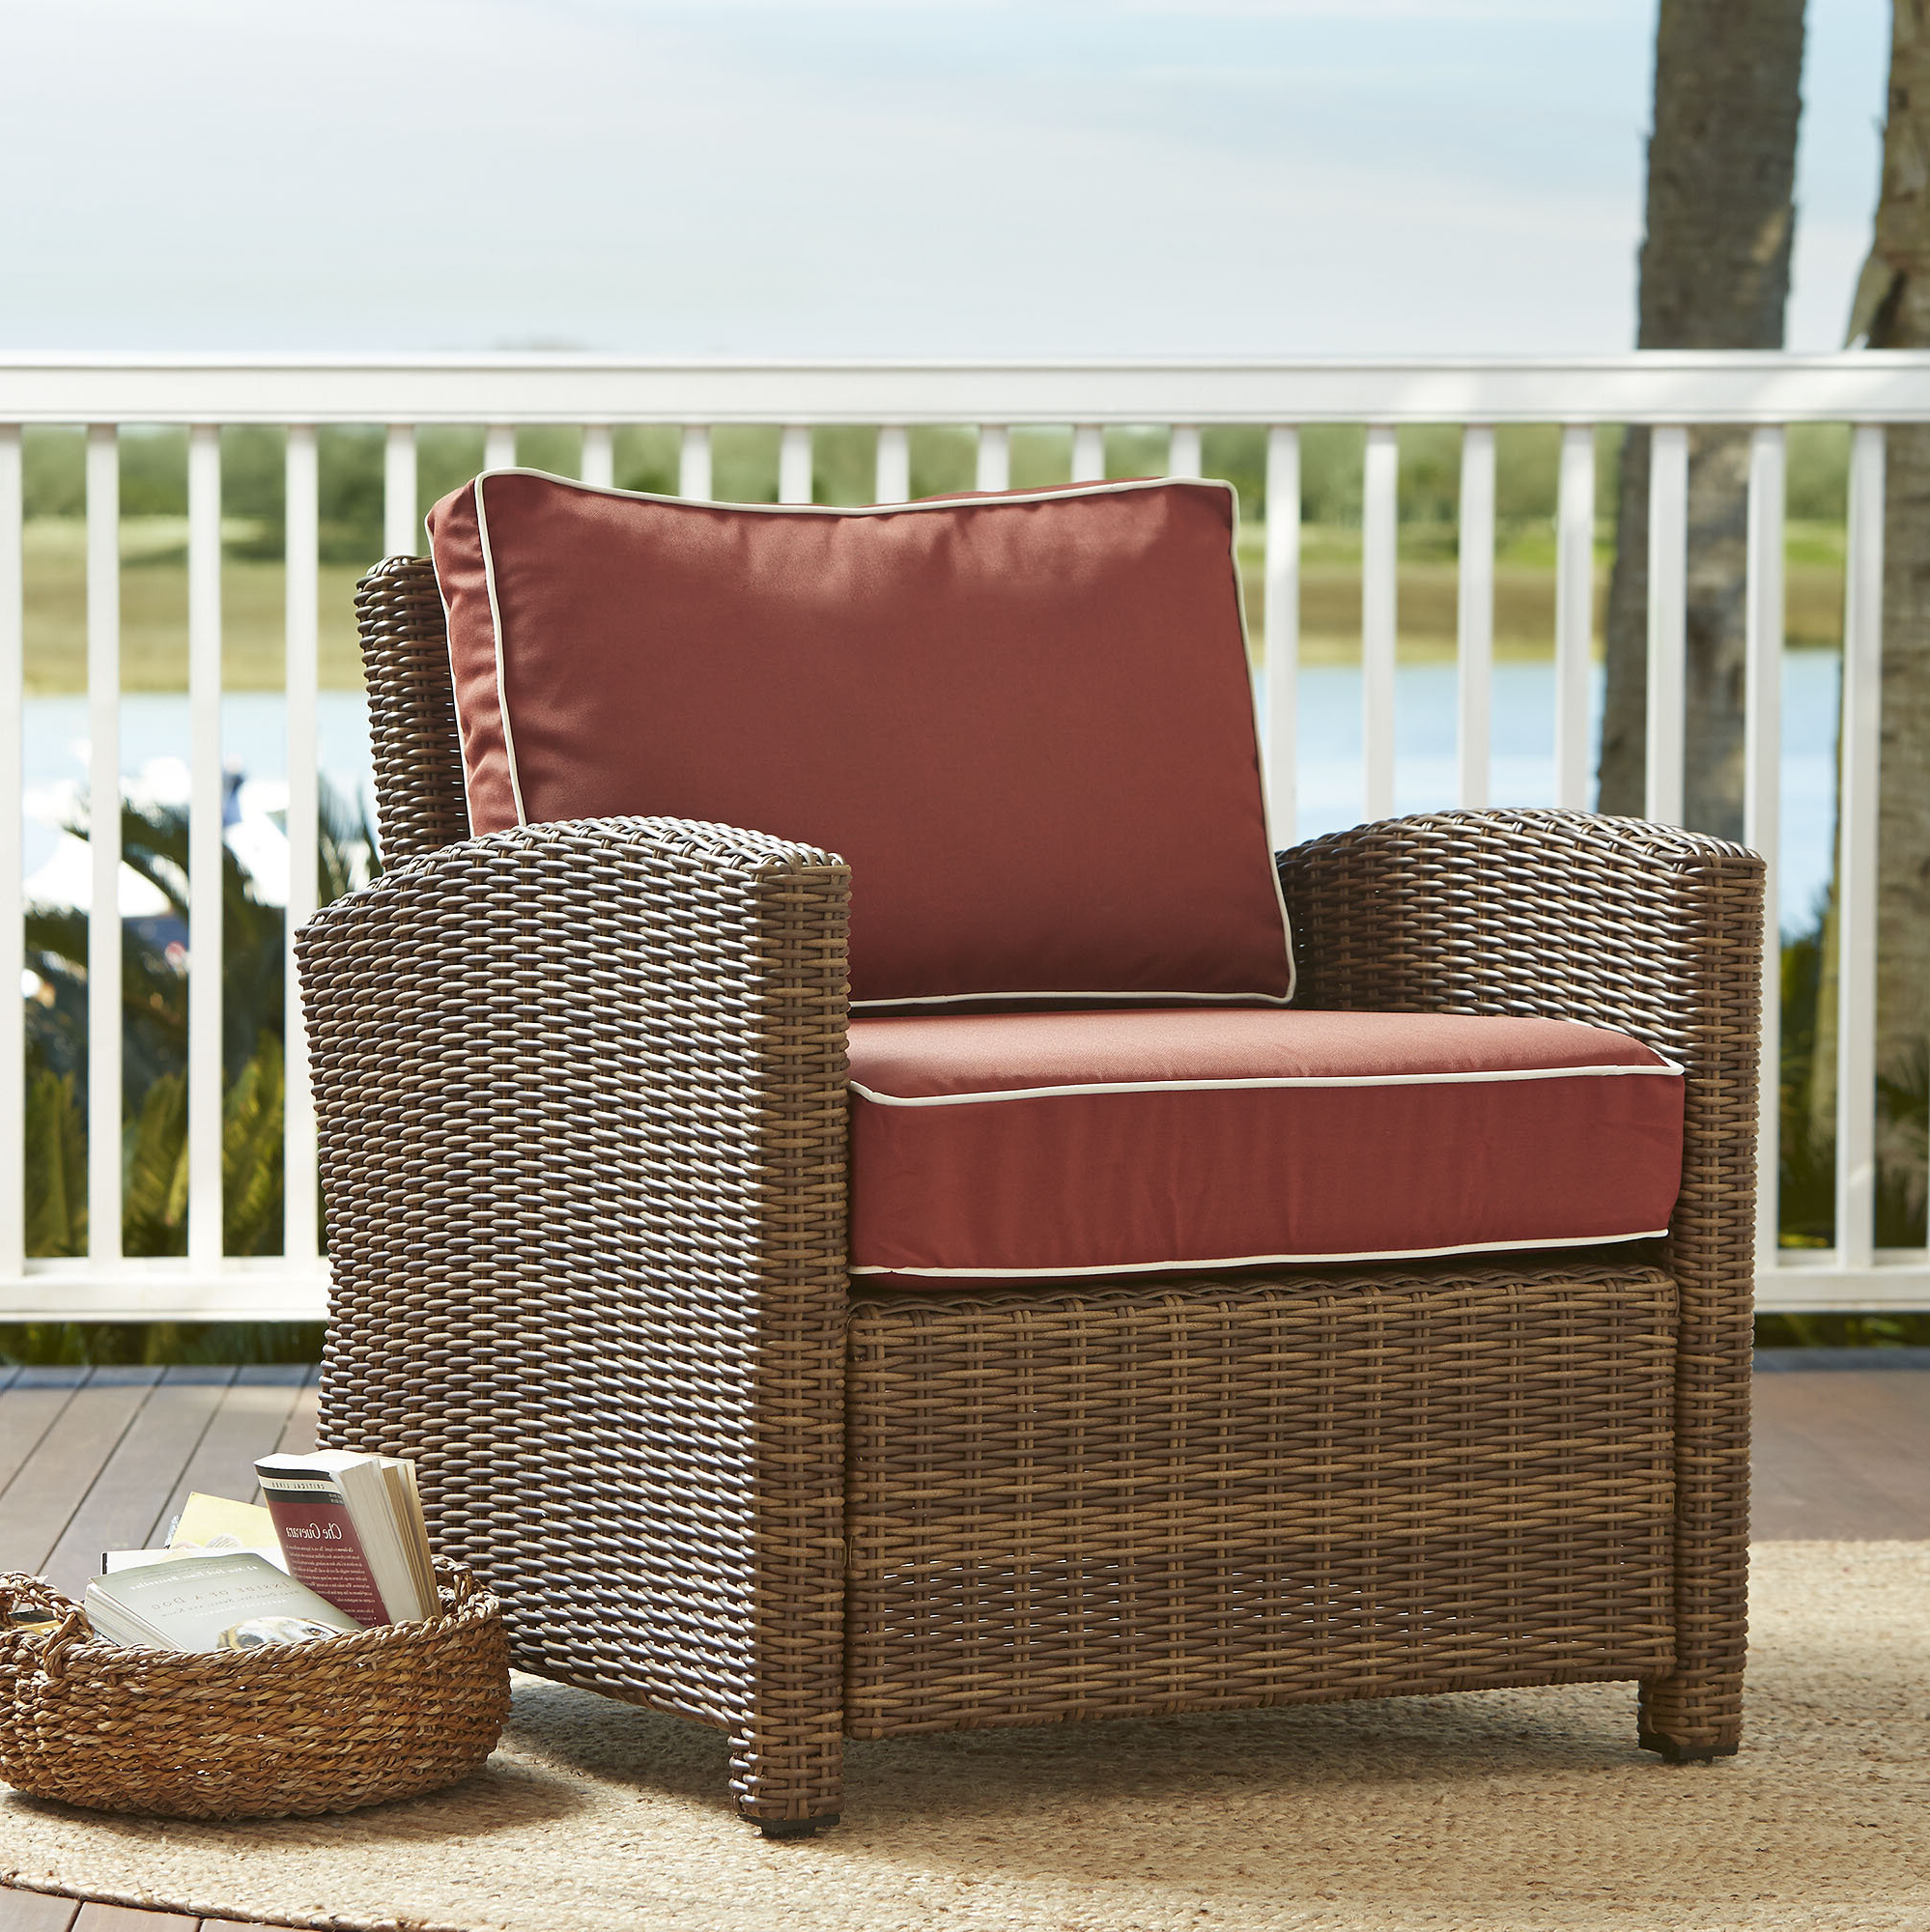 Lawson Patio Sofas With Cushions Regarding Most Popular Lawson Patio Chair With Cushions (Gallery 9 of 25)